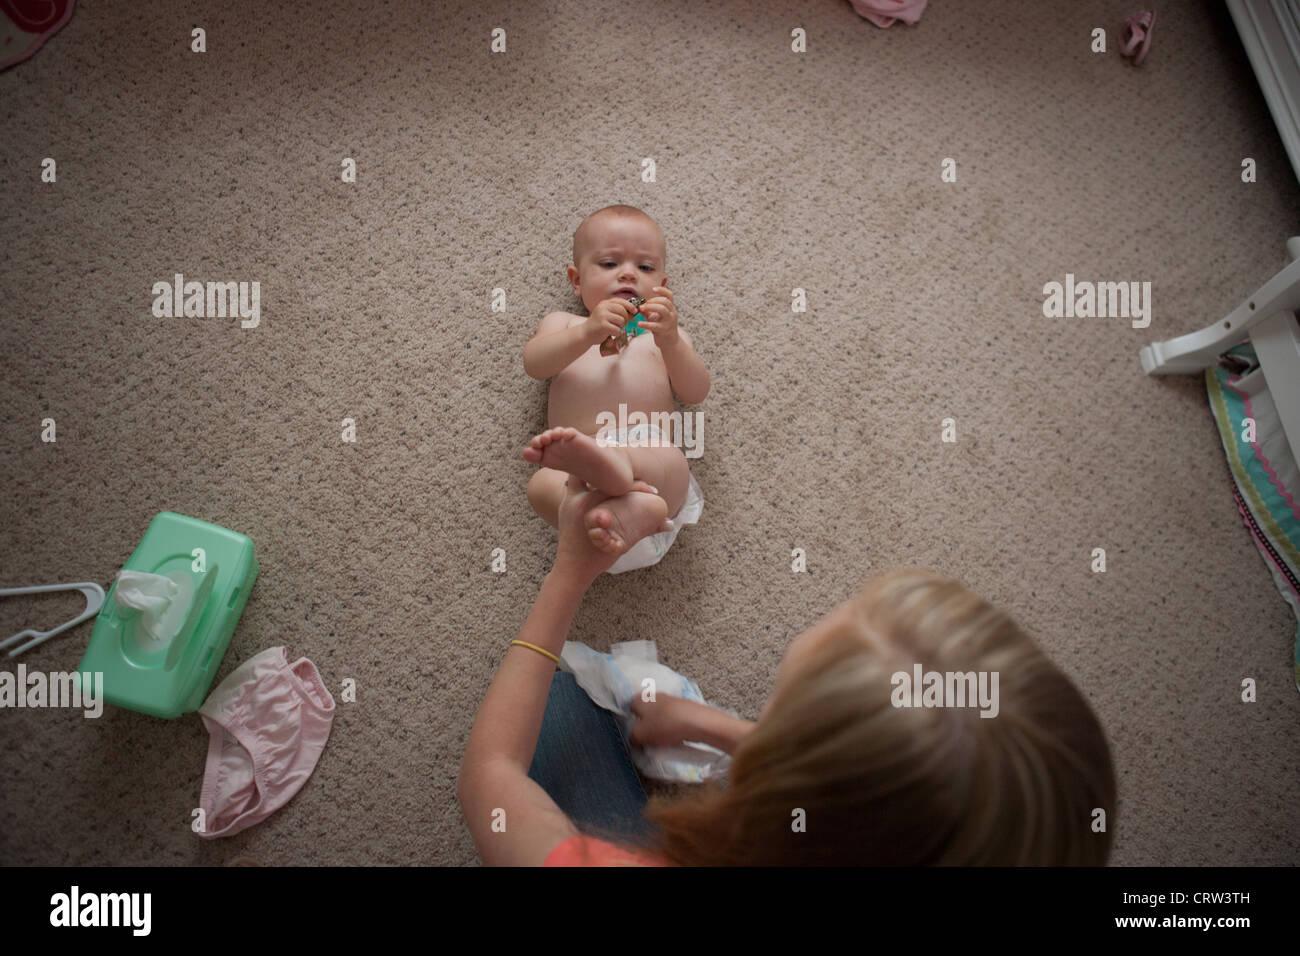 Hermana Mayor cambio de pañal para hermana de 10 meses en casa. Imagen De Stock